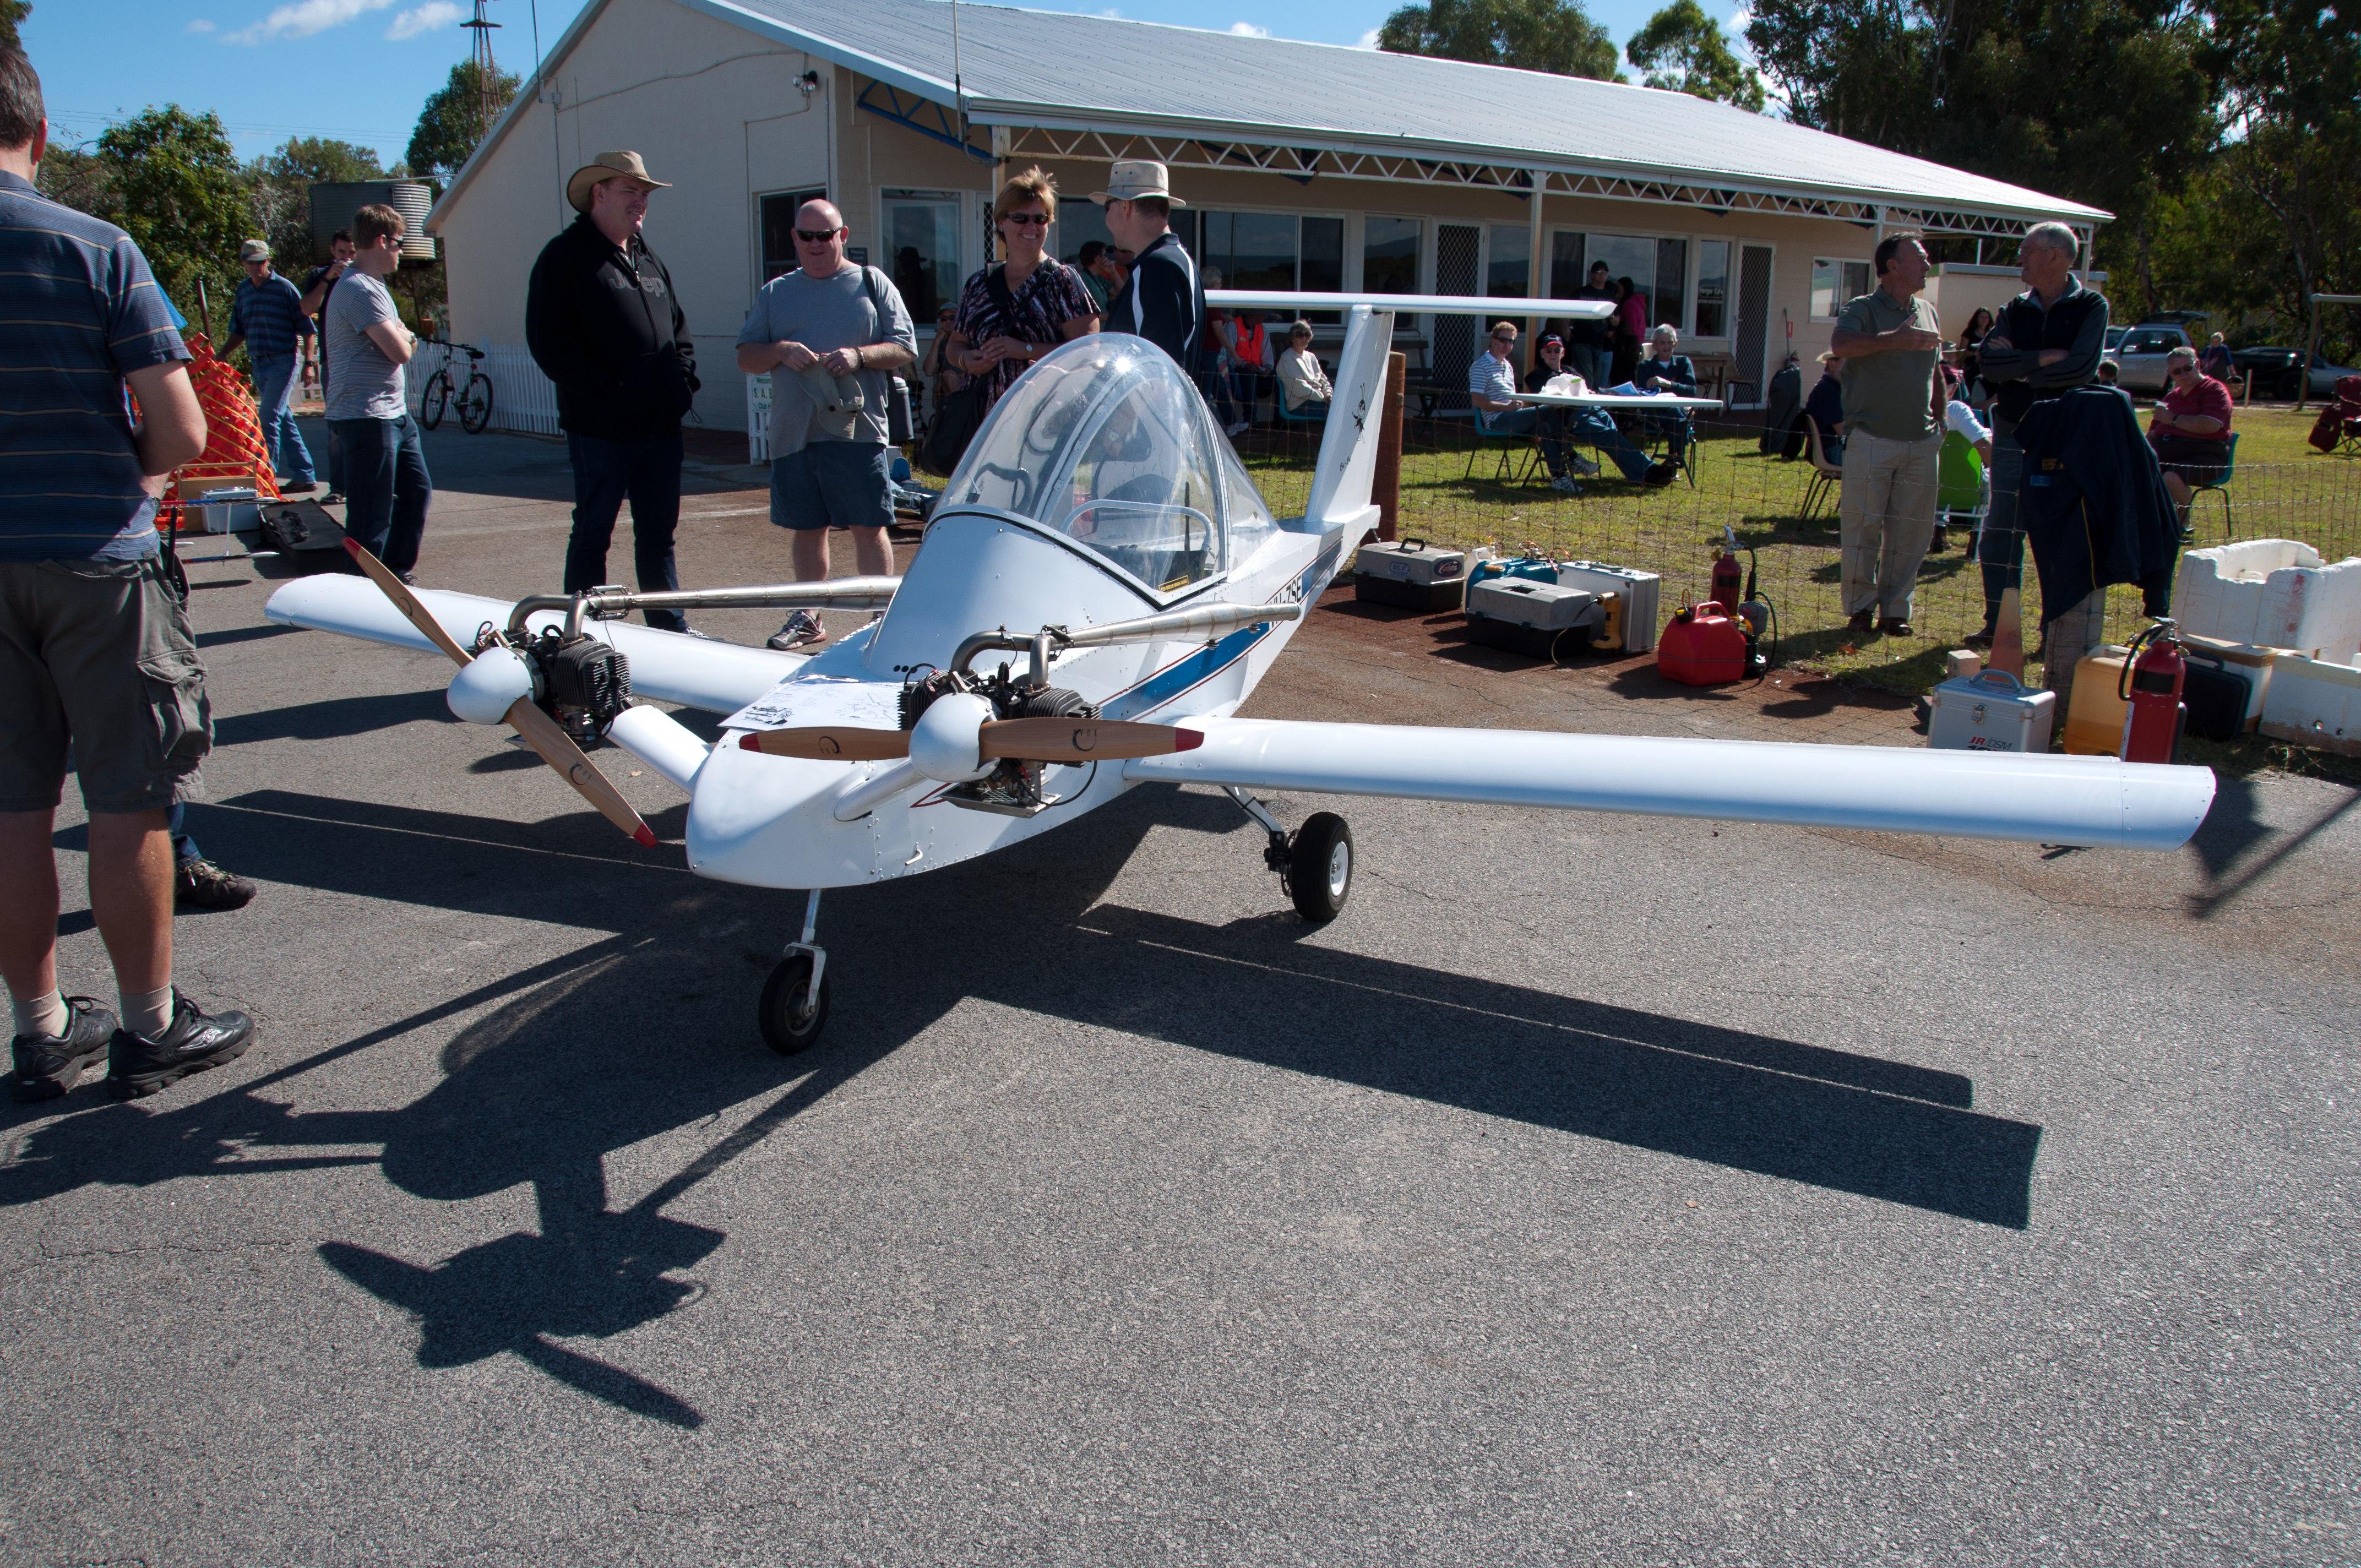 Serpentine SABC SAAA fly in aviation ufc uni flying club jandakot cri cri